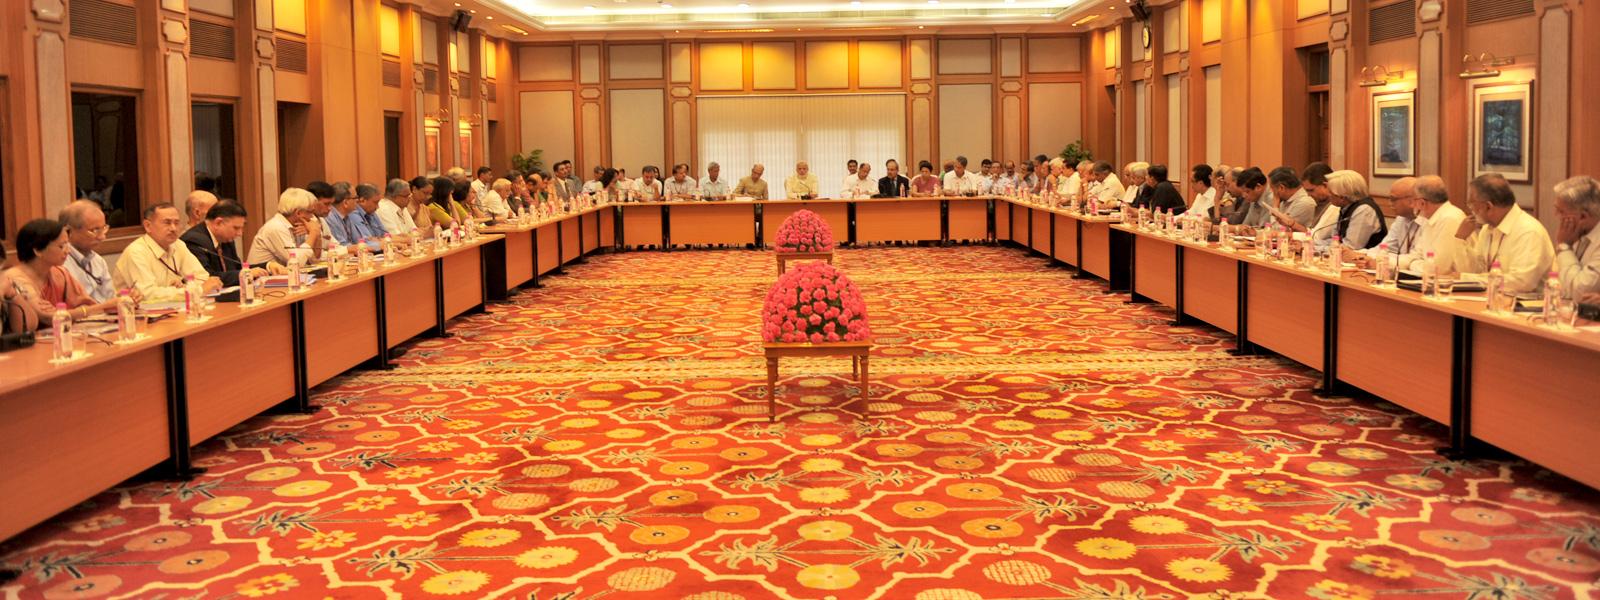 Narendra Modi's meeting with secretaries in the Central government in June 2014. Credit: narendramodi.n